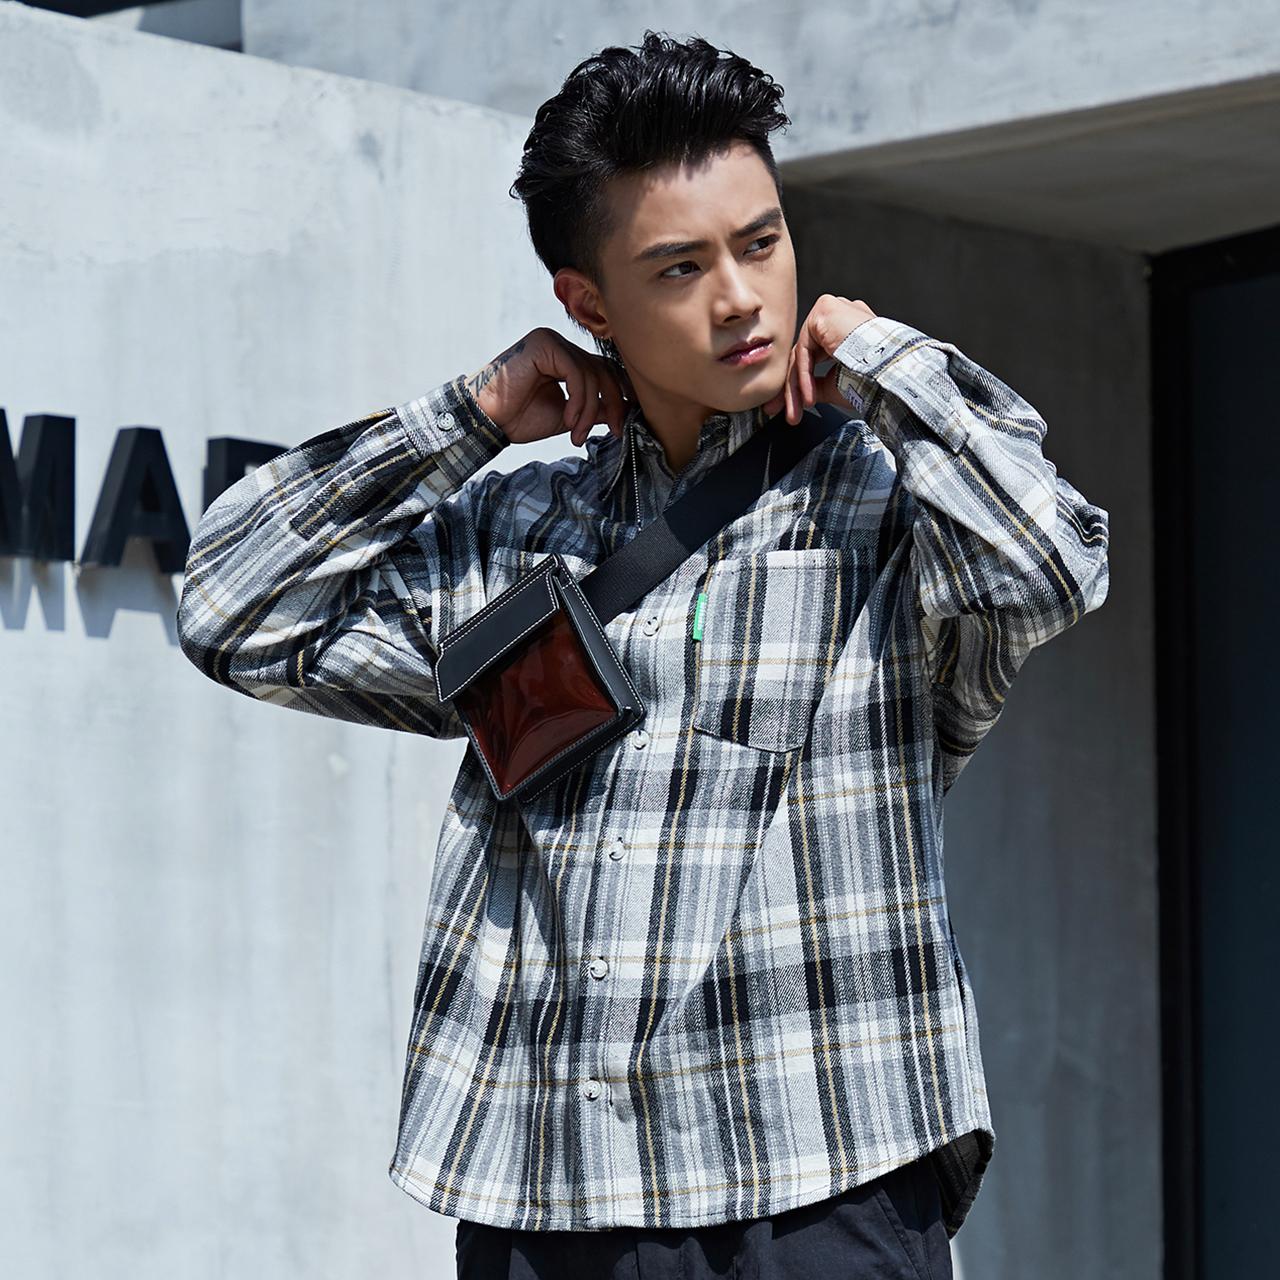 WEX 衬衫男长袖潮牌灰白格子衫宽松男韩版潮流ifashion男衣